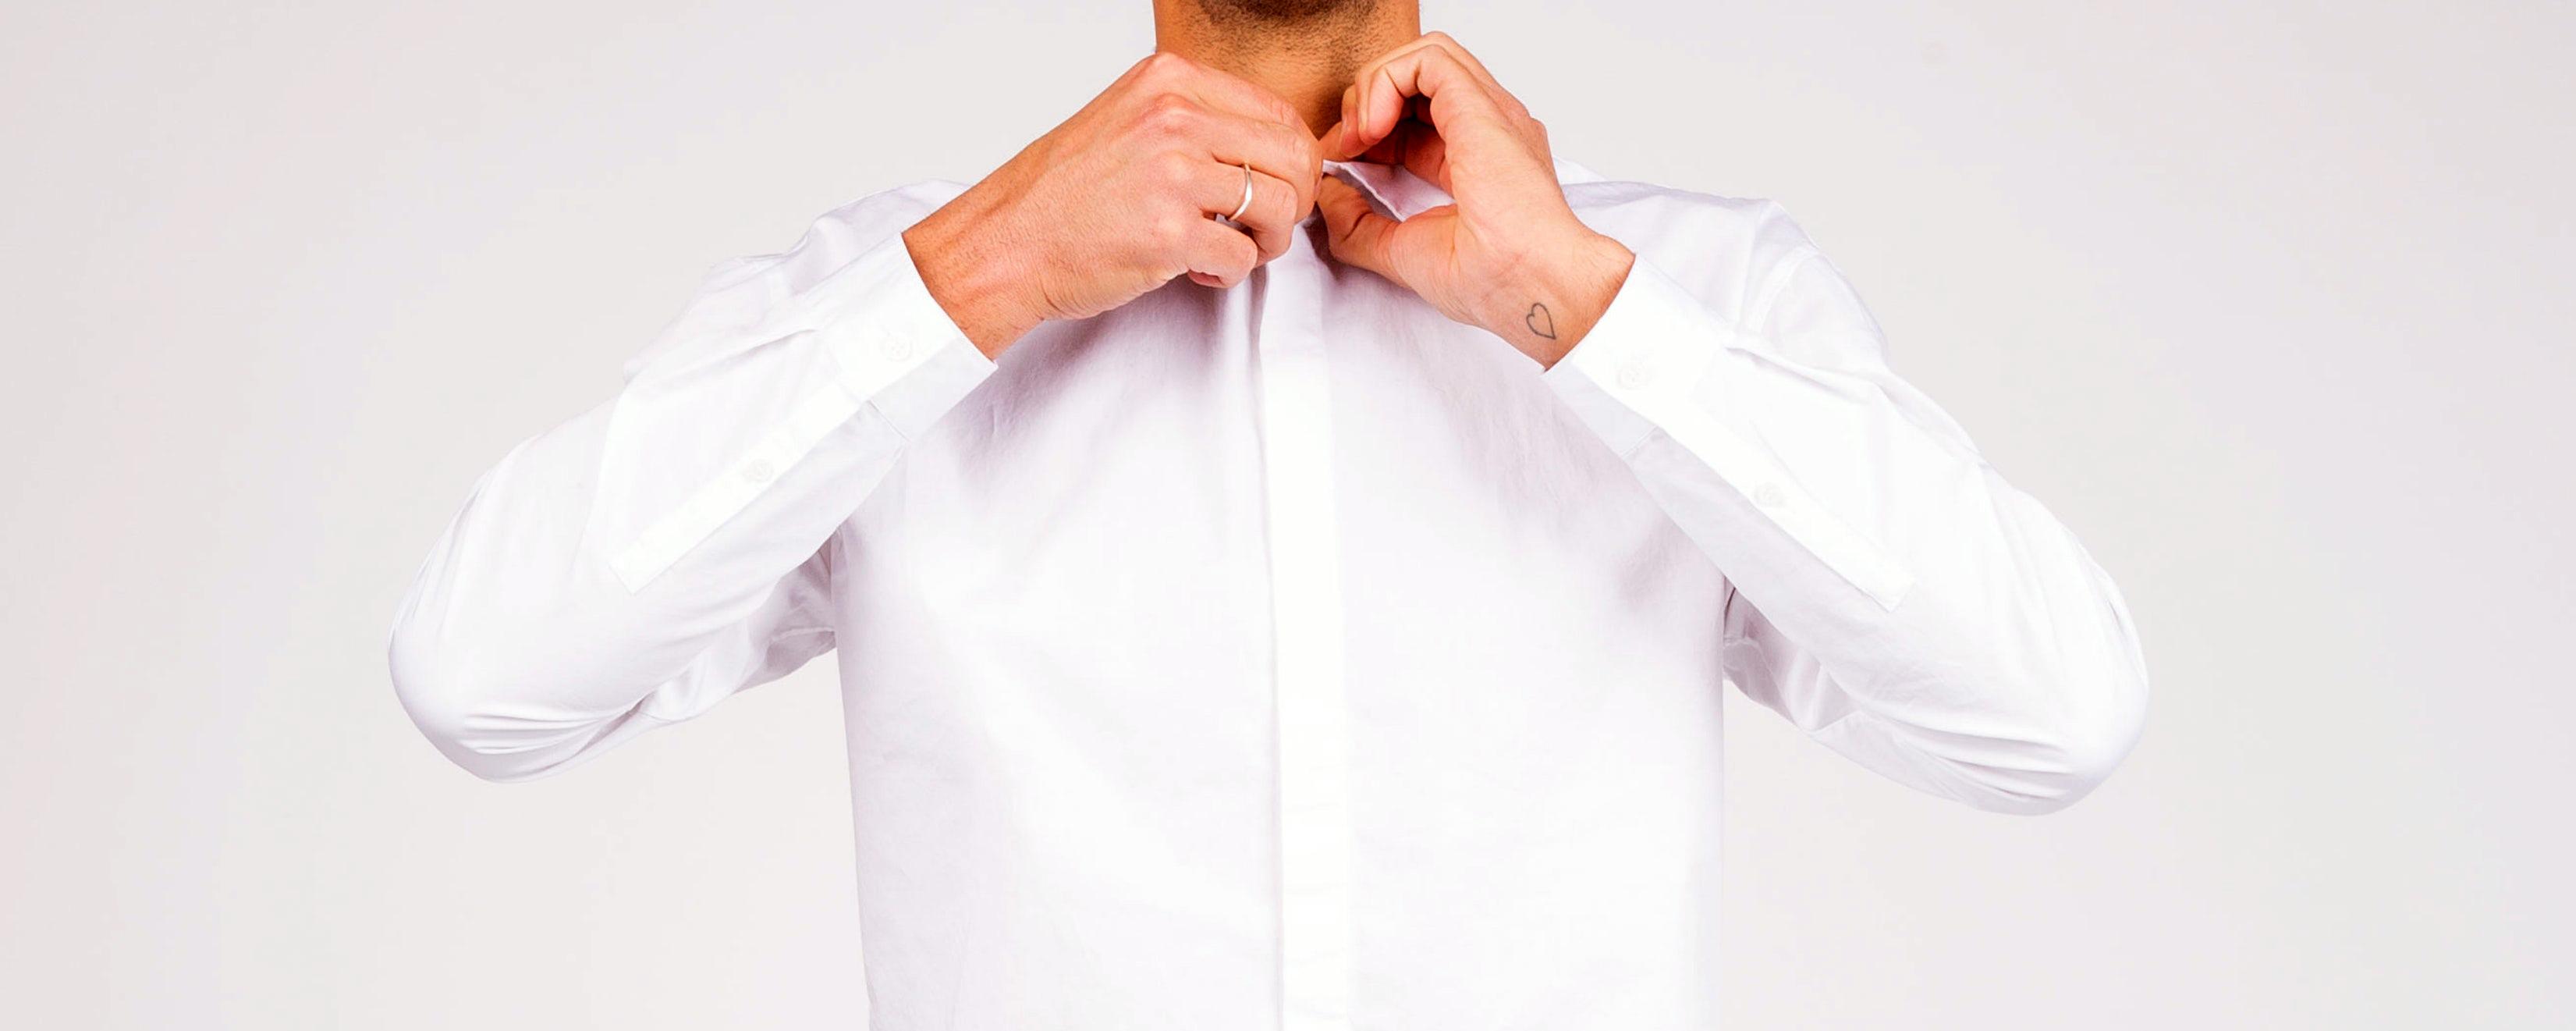 White shirt - Monarch Laundry Testimonials, York